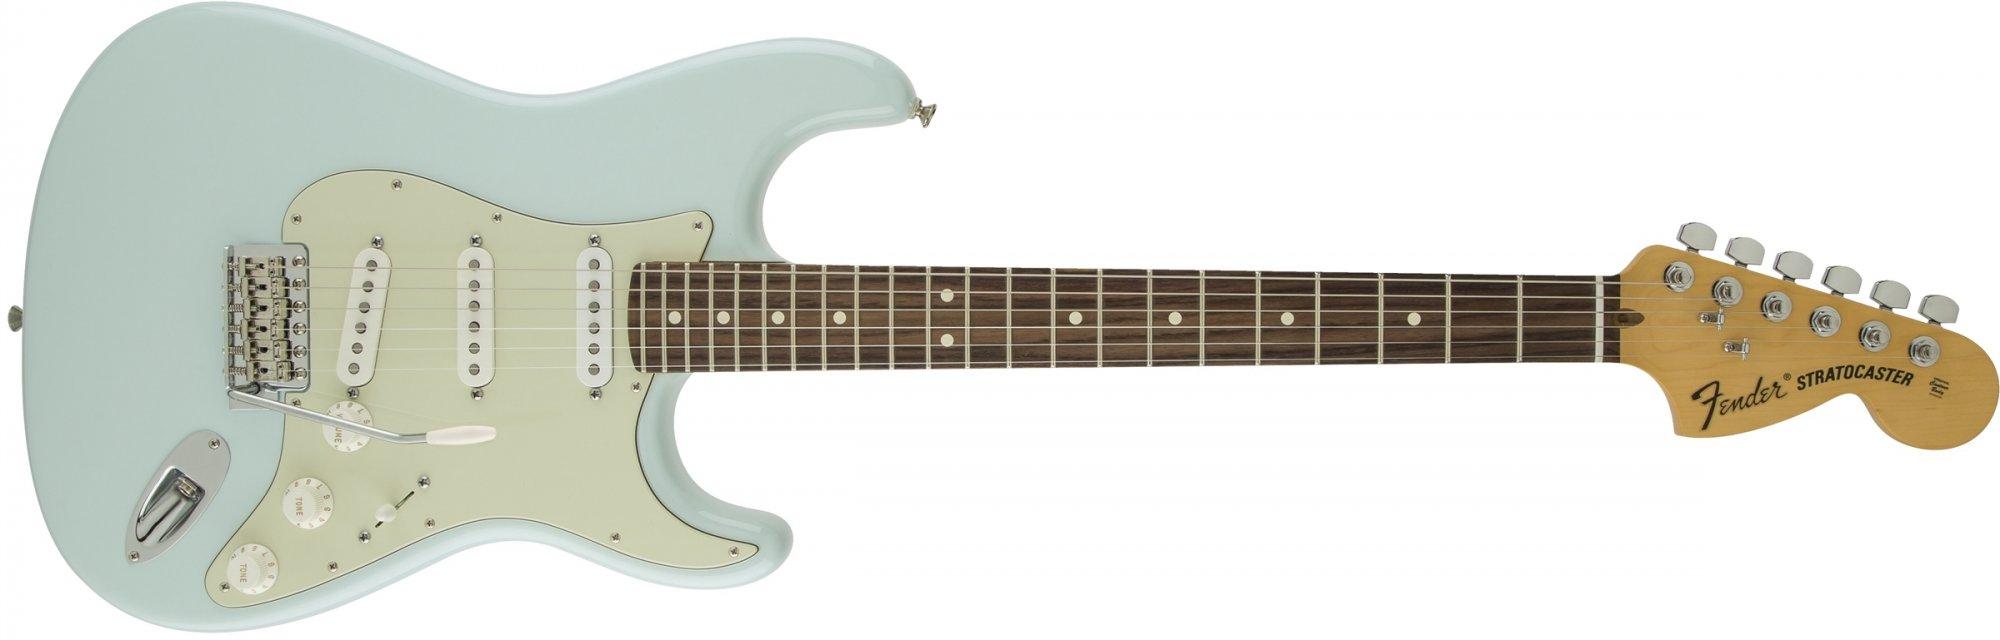 Fender American Special Stratocaster Electric Gutiar